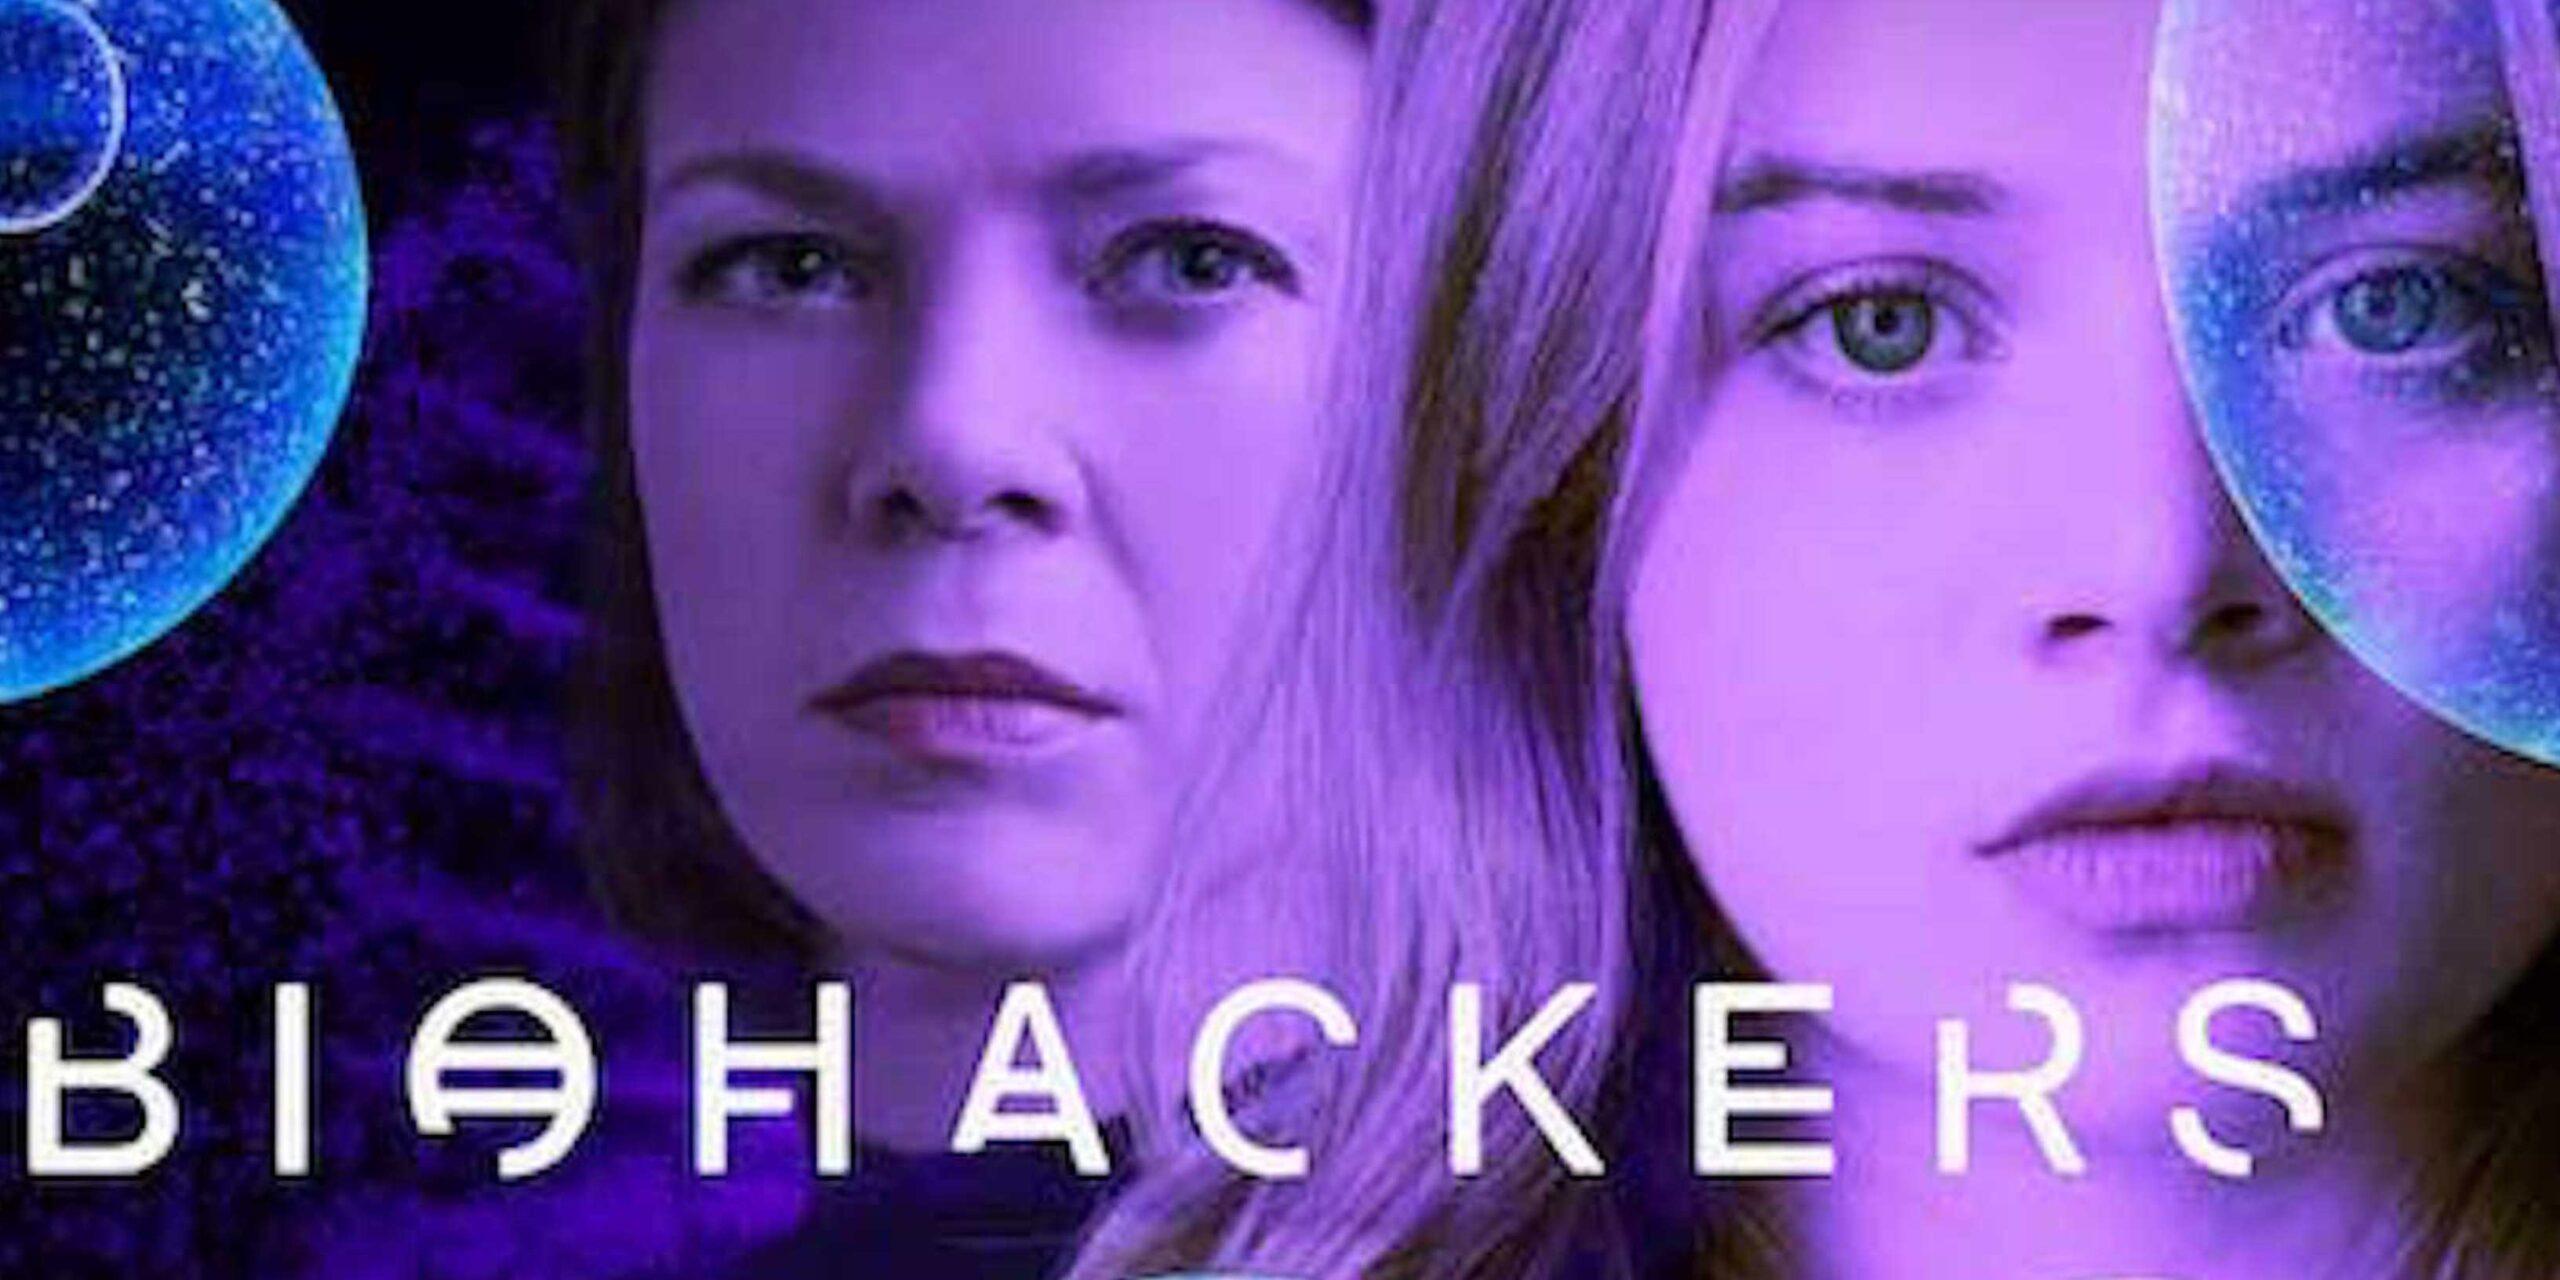 Biohackers: trama, cast, trailer, data uscita su Netflix